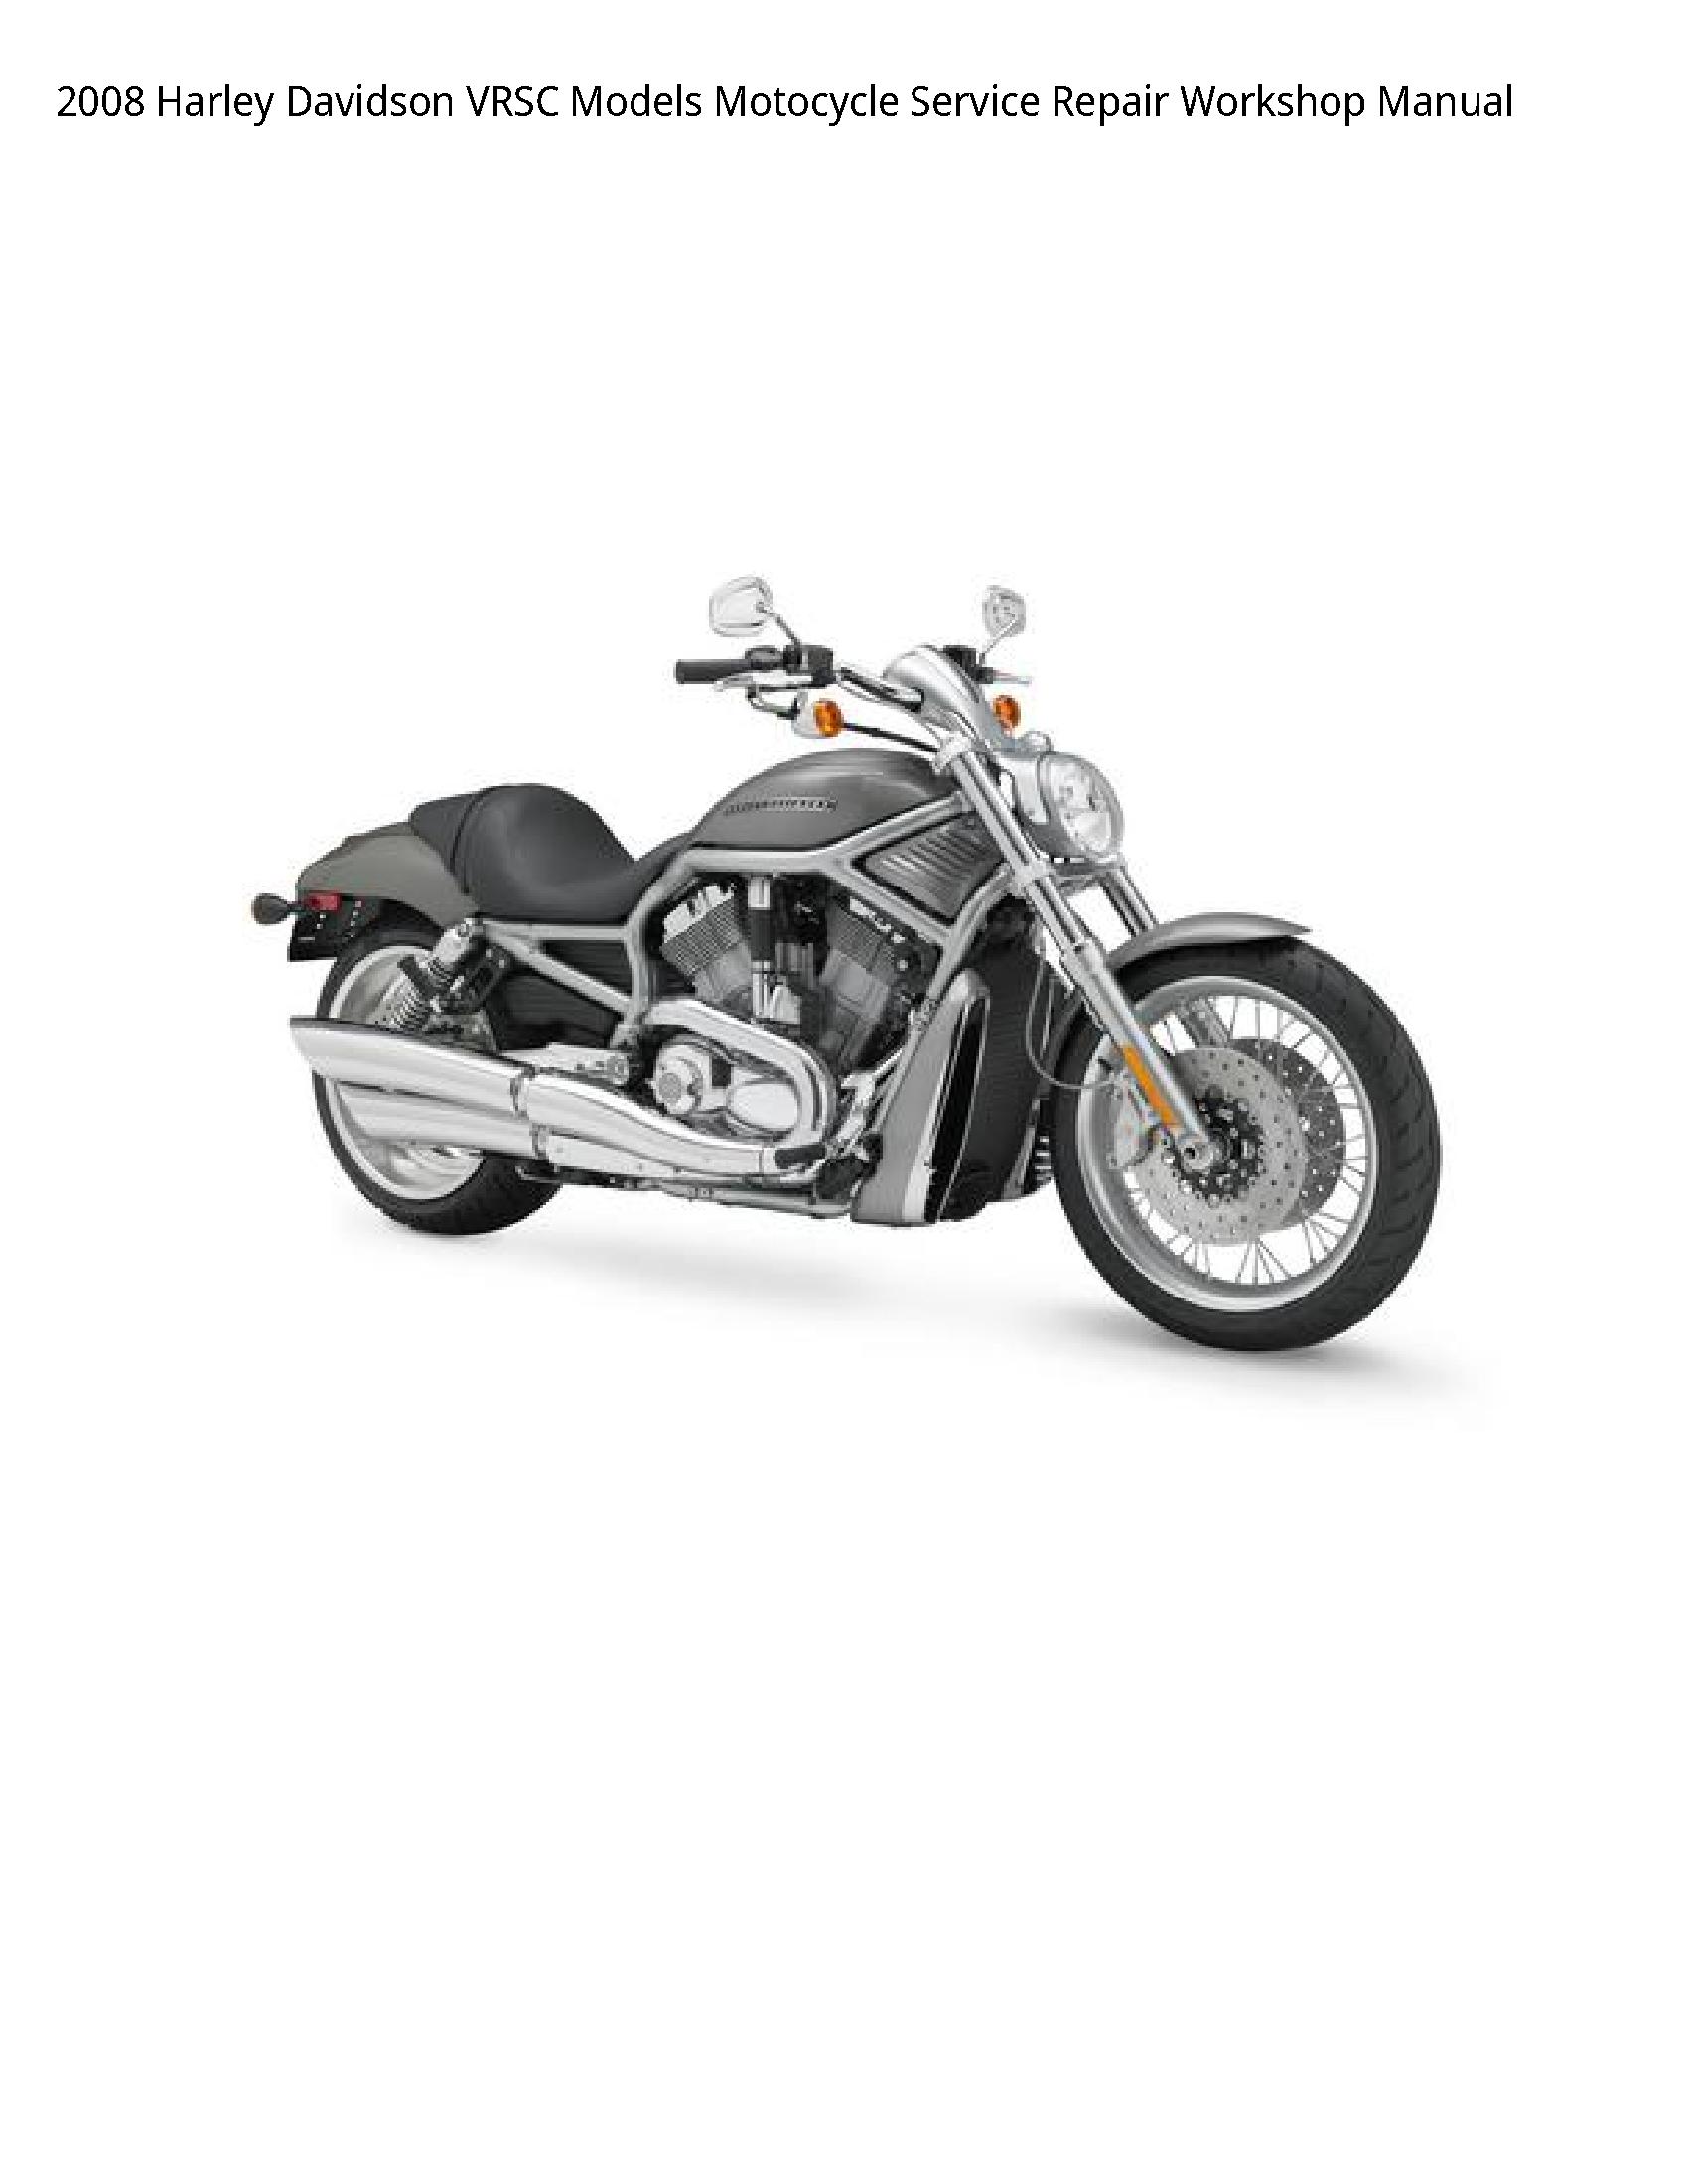 Harley Davidson VRSC Motocycle manual